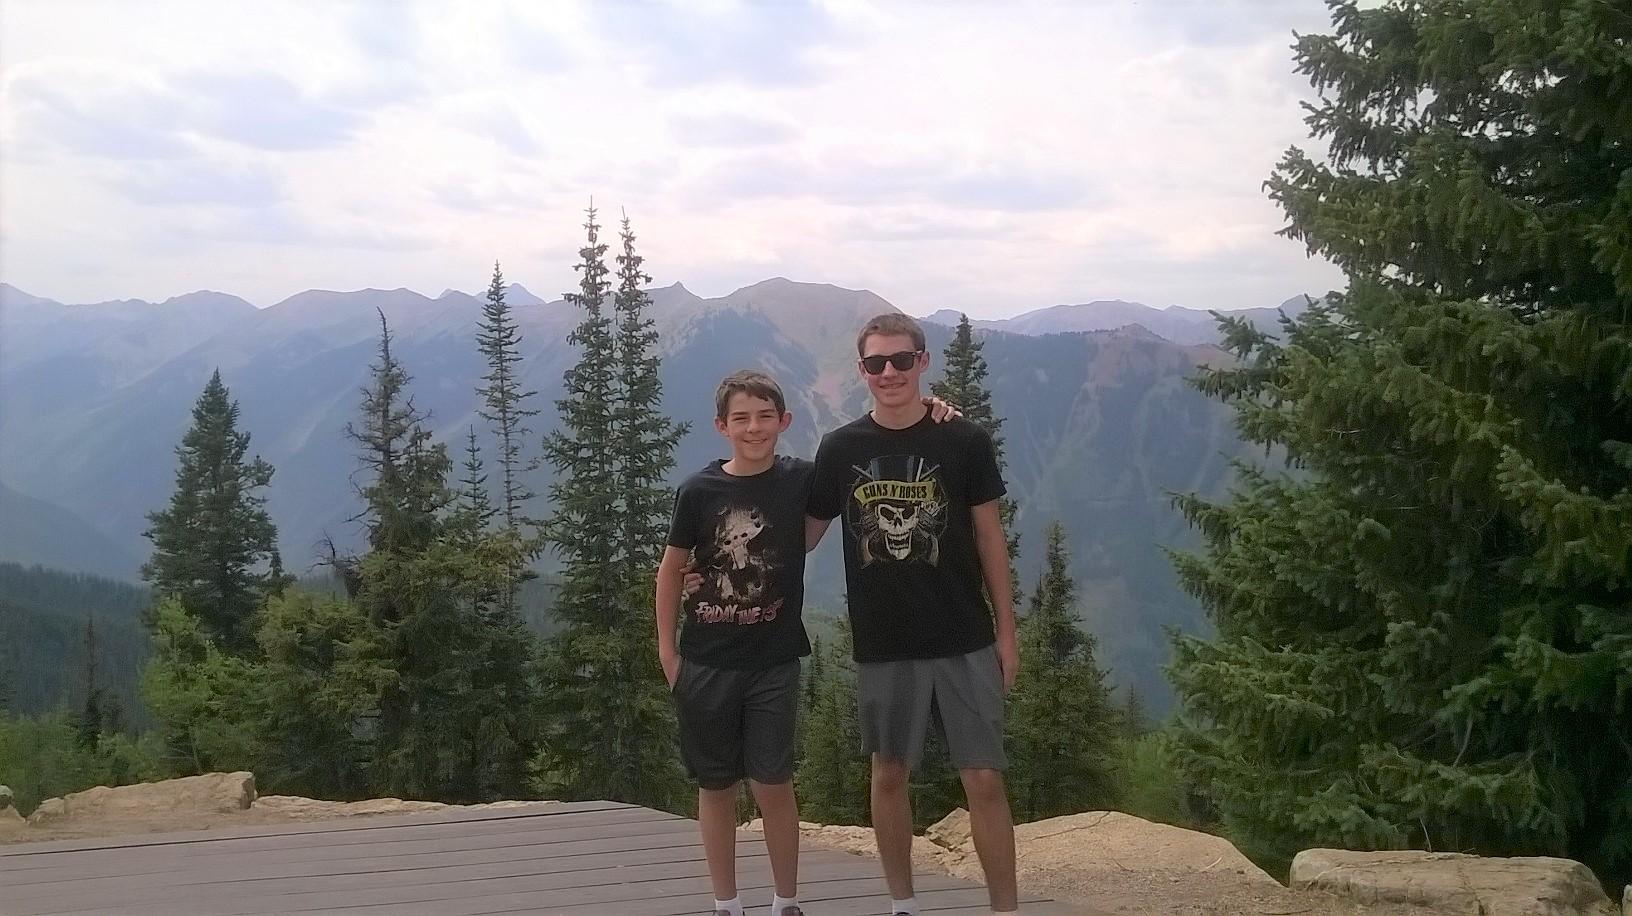 Brothers, Luke and Jack Hamm